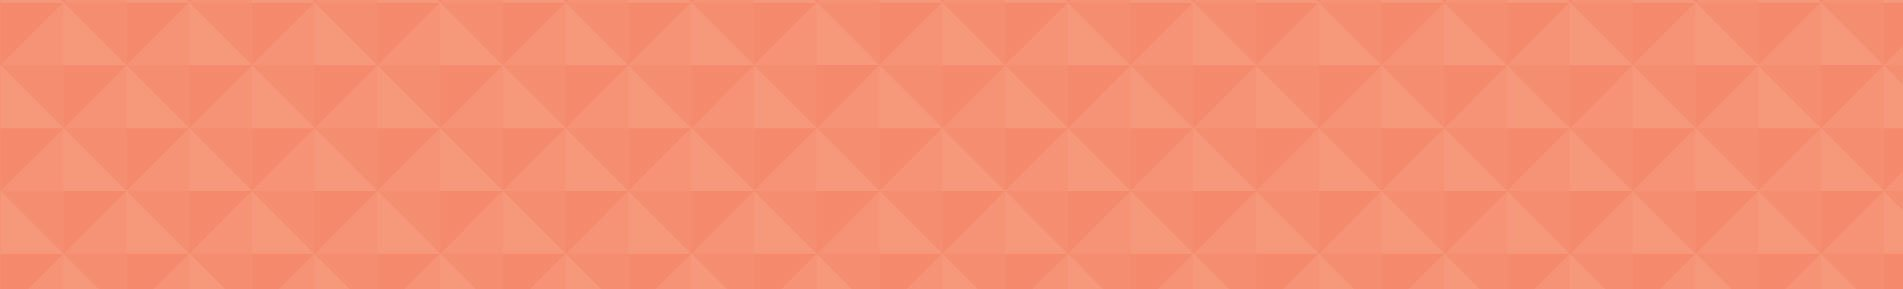 7614_WEB_Covisum_landing-page-graphics_tc-cta.jpg